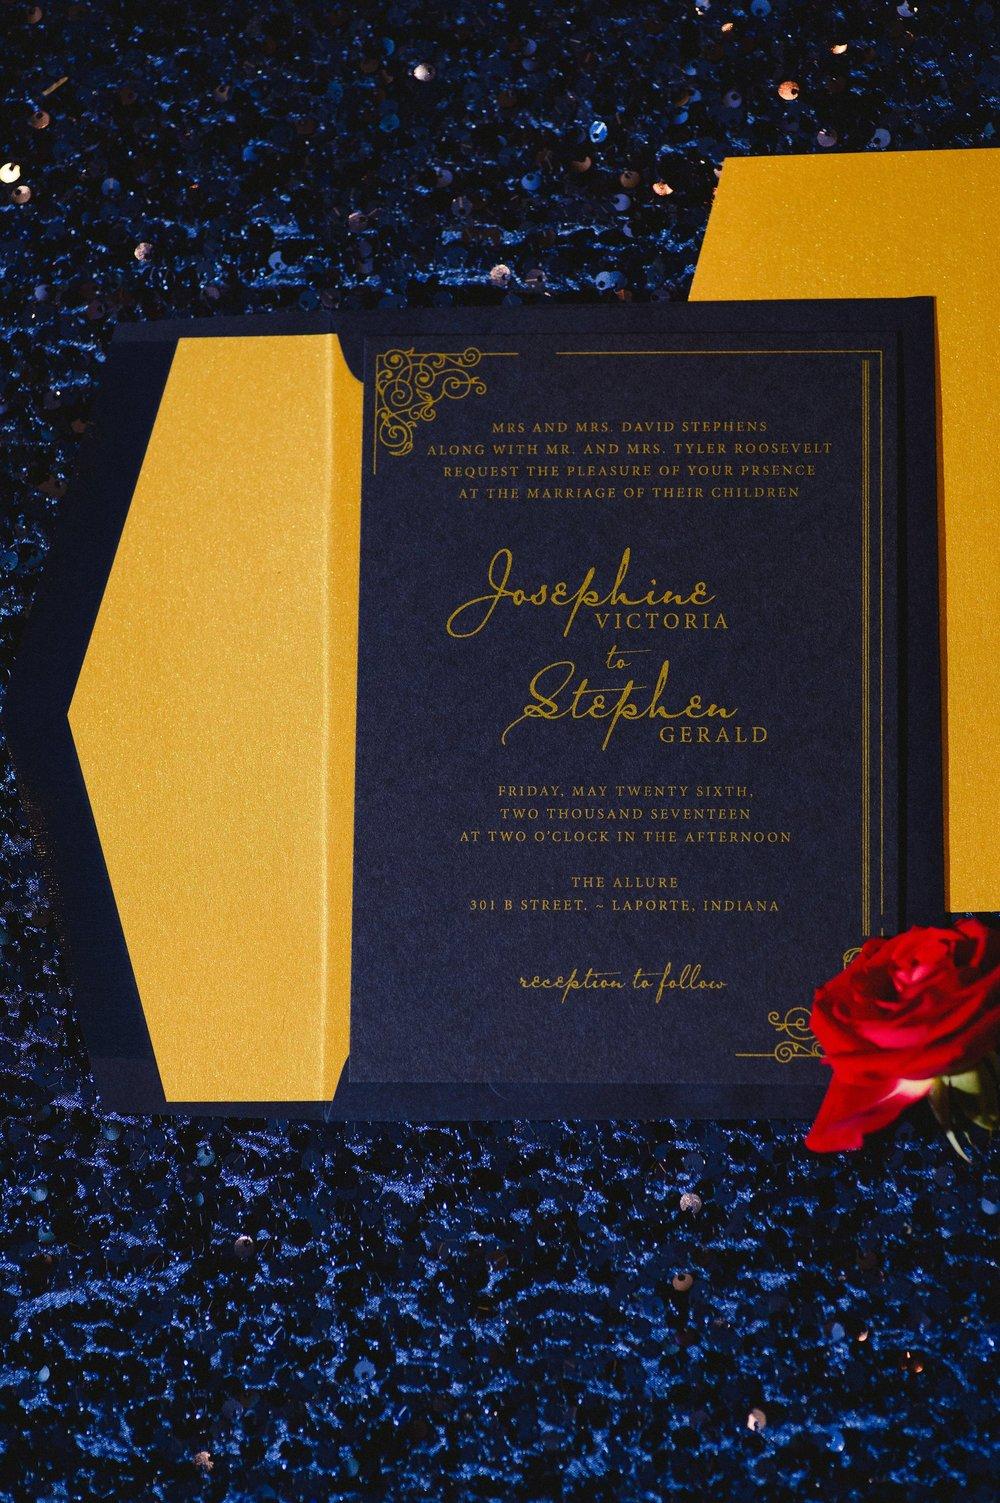 KatherineMurrayPhotography_StyledShoot_Wedding_BeautyAndTheBeast_ATaleAsOldAsTime_theAllure_LaPorteIndiana00254-min.jpg